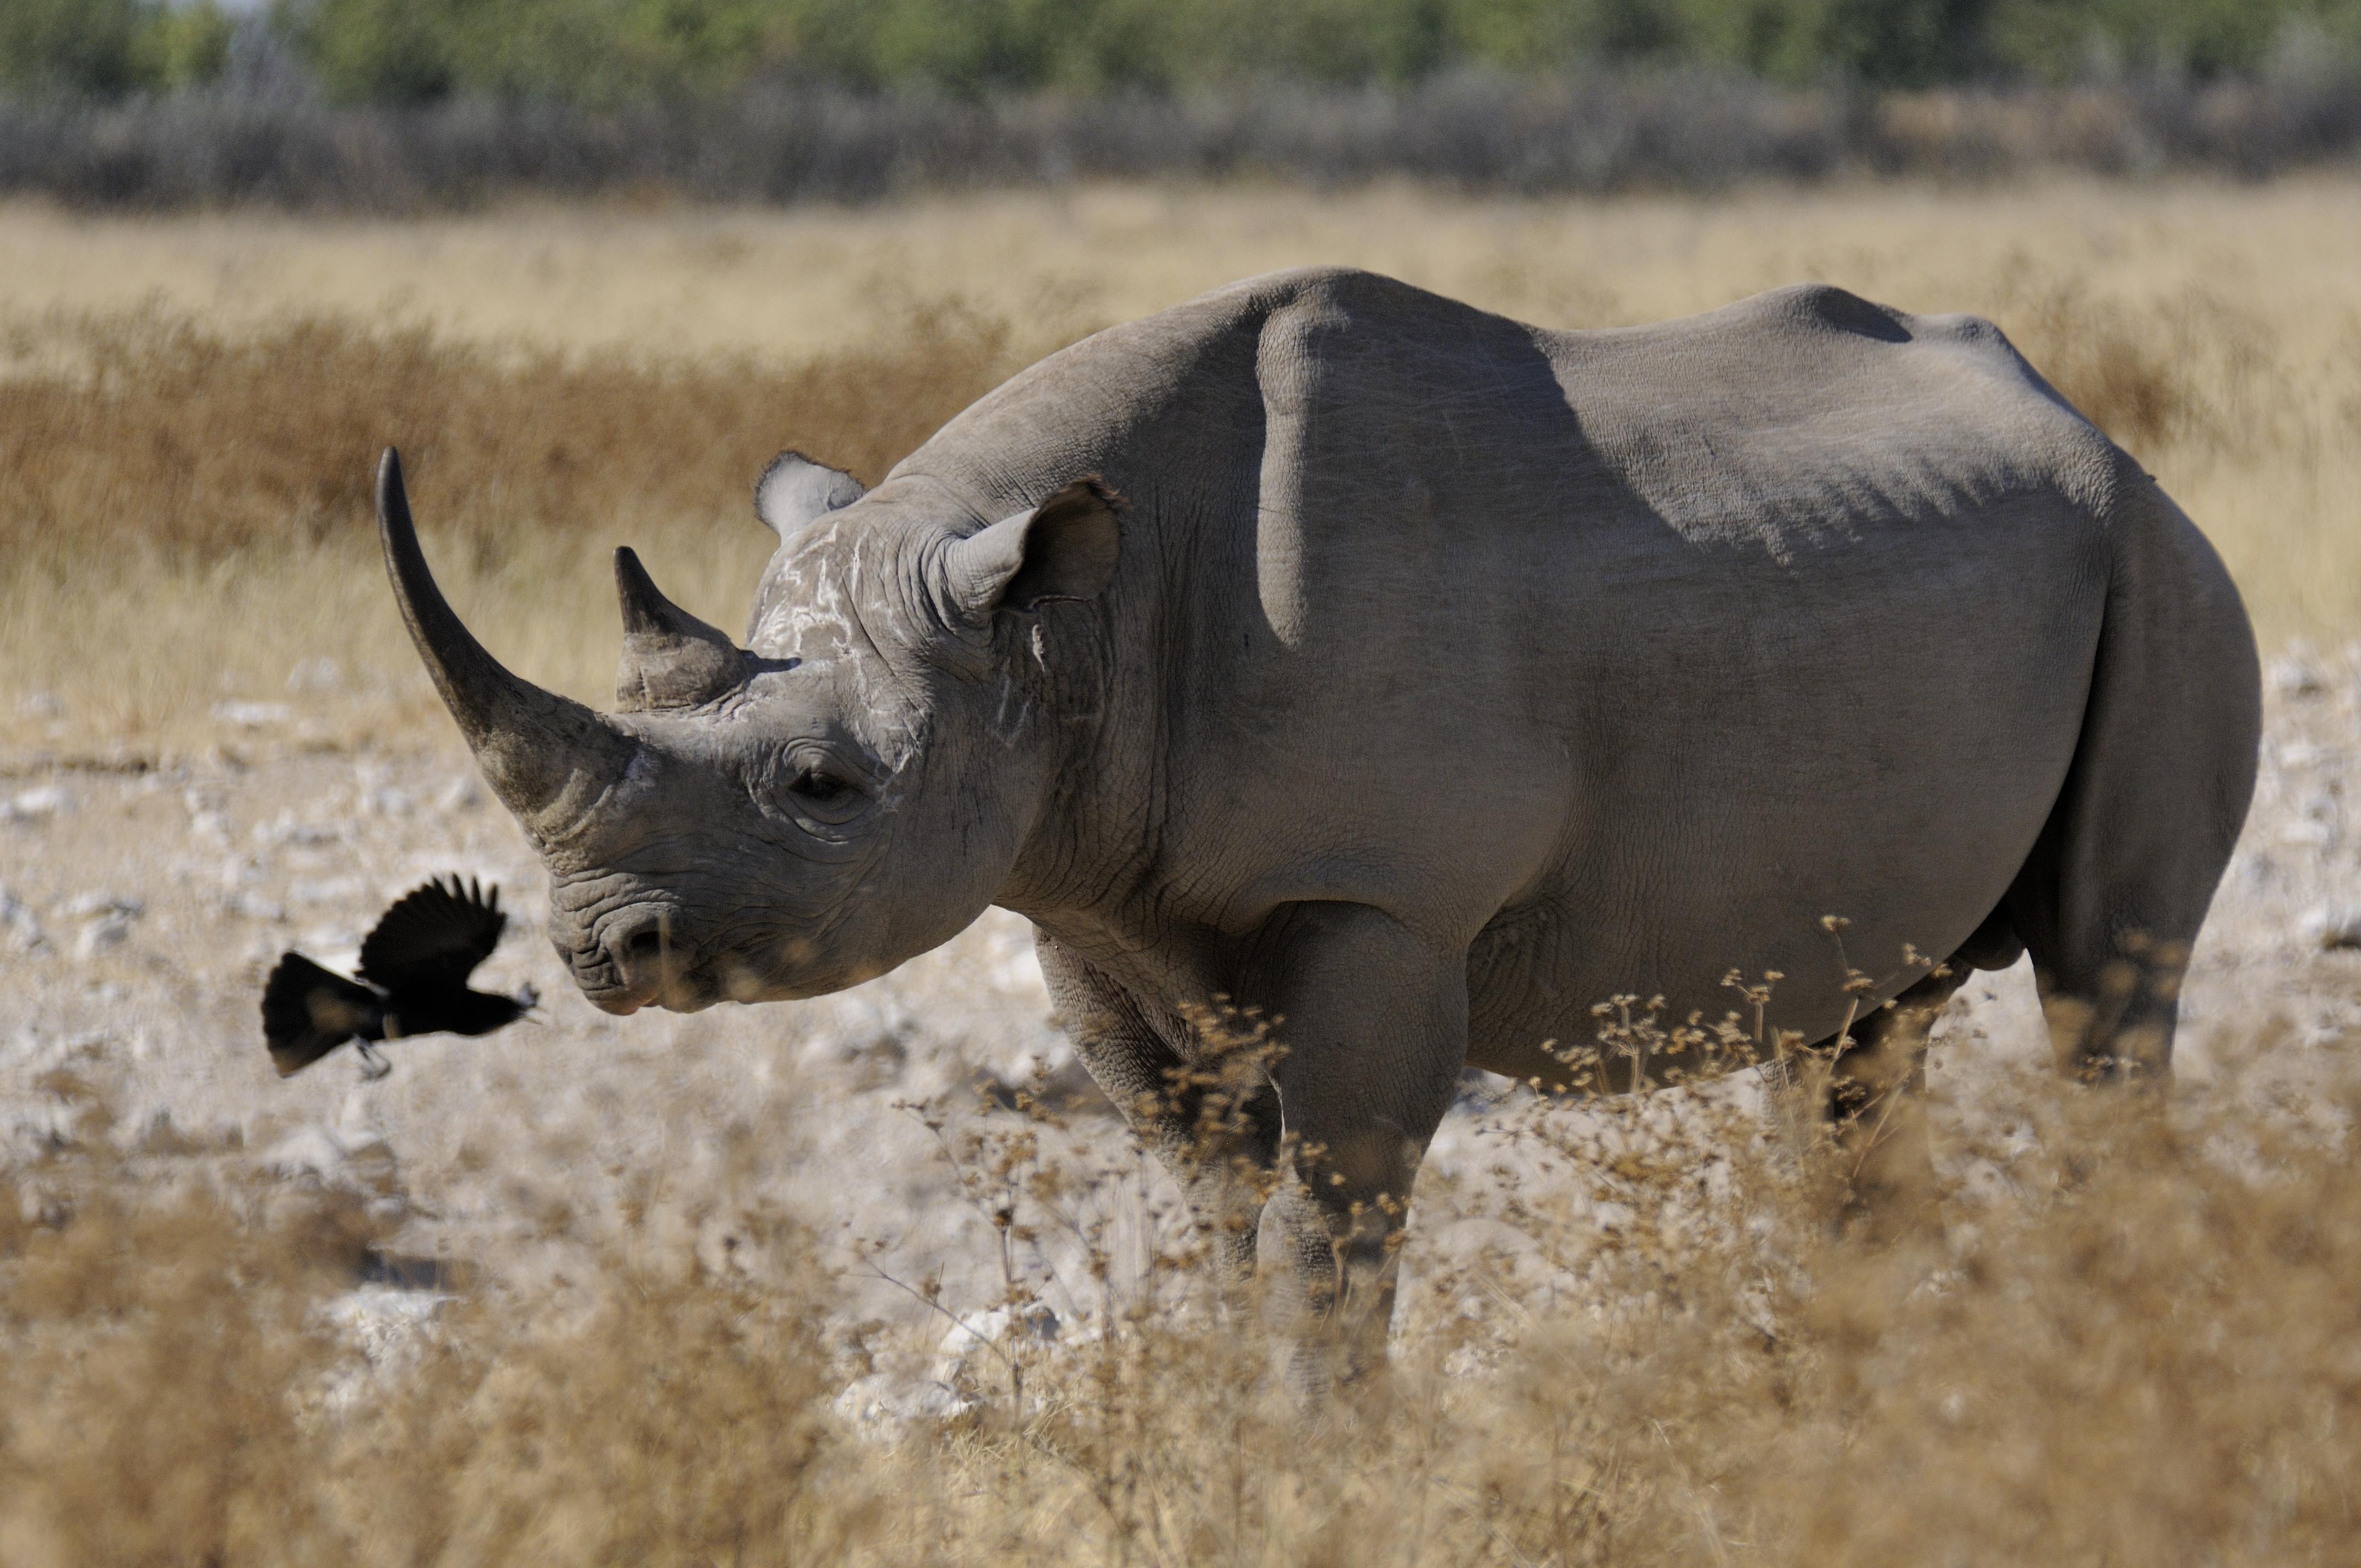 black-rhino-with-bird